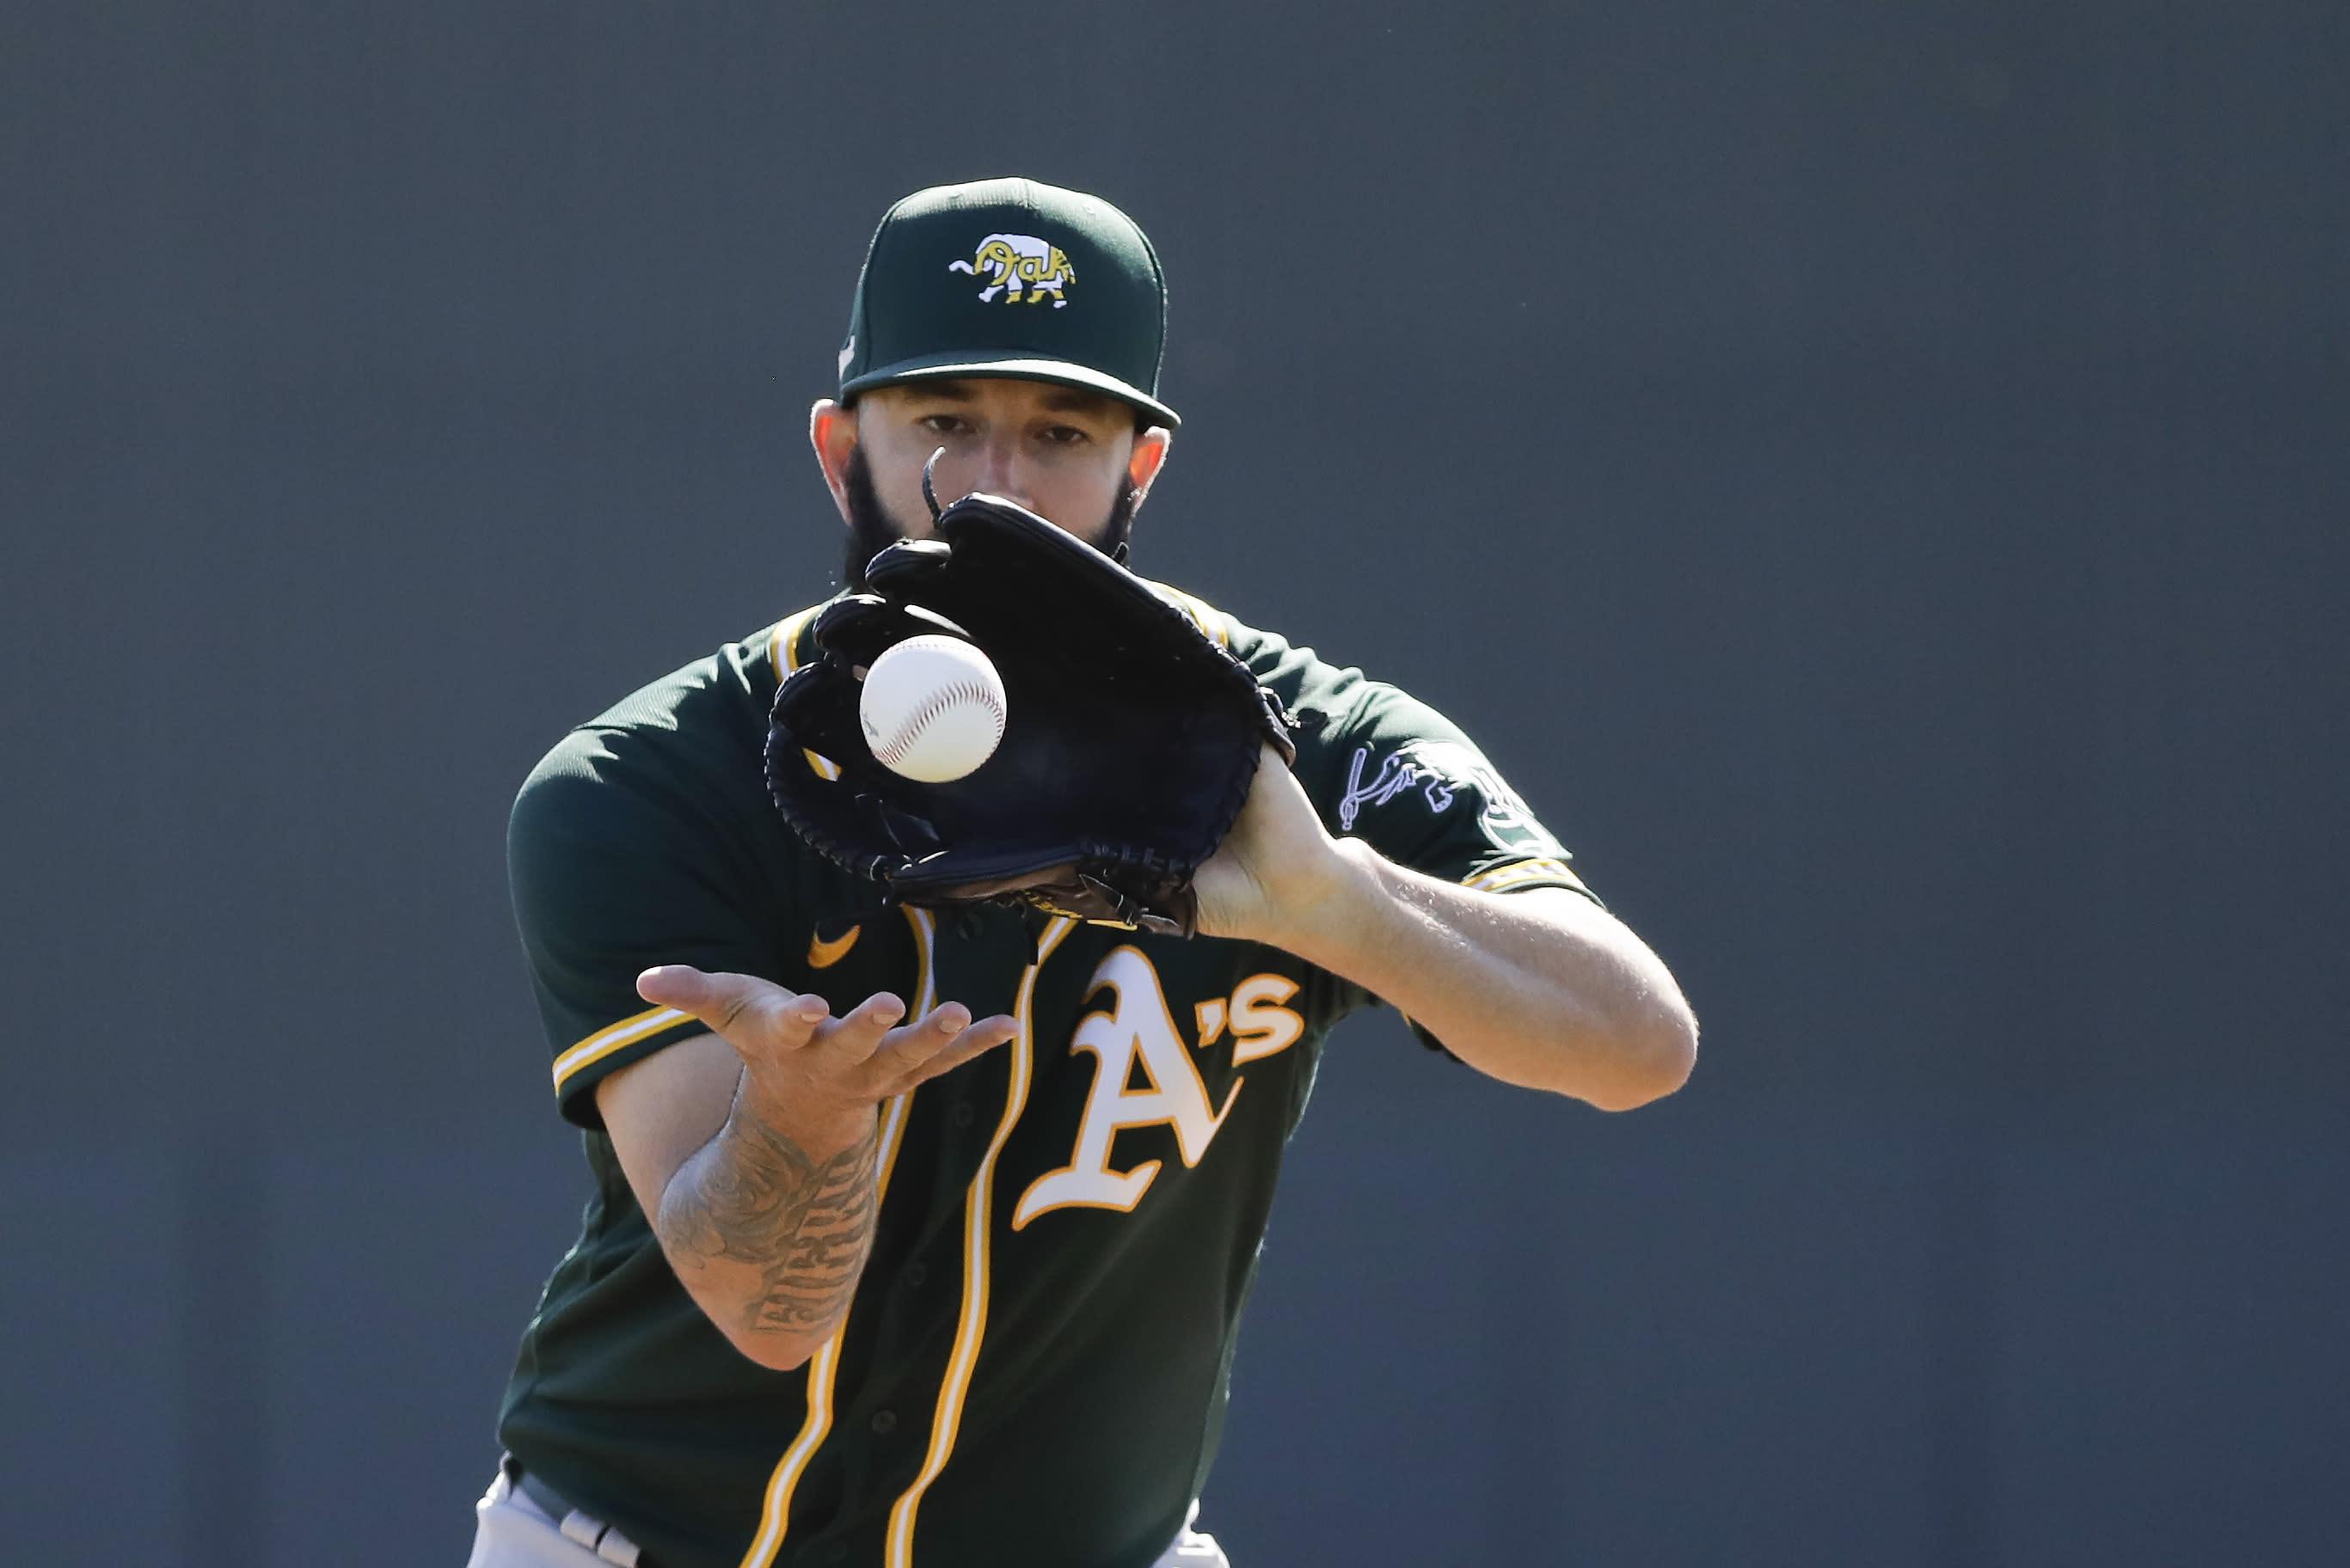 Oakland Athletics' Mike Fiers runs a drill during spring training baseball practice, Thursday, Feb. 13, 2020, in Mesa, Ariz. (AP Photo/Darron Cummings)